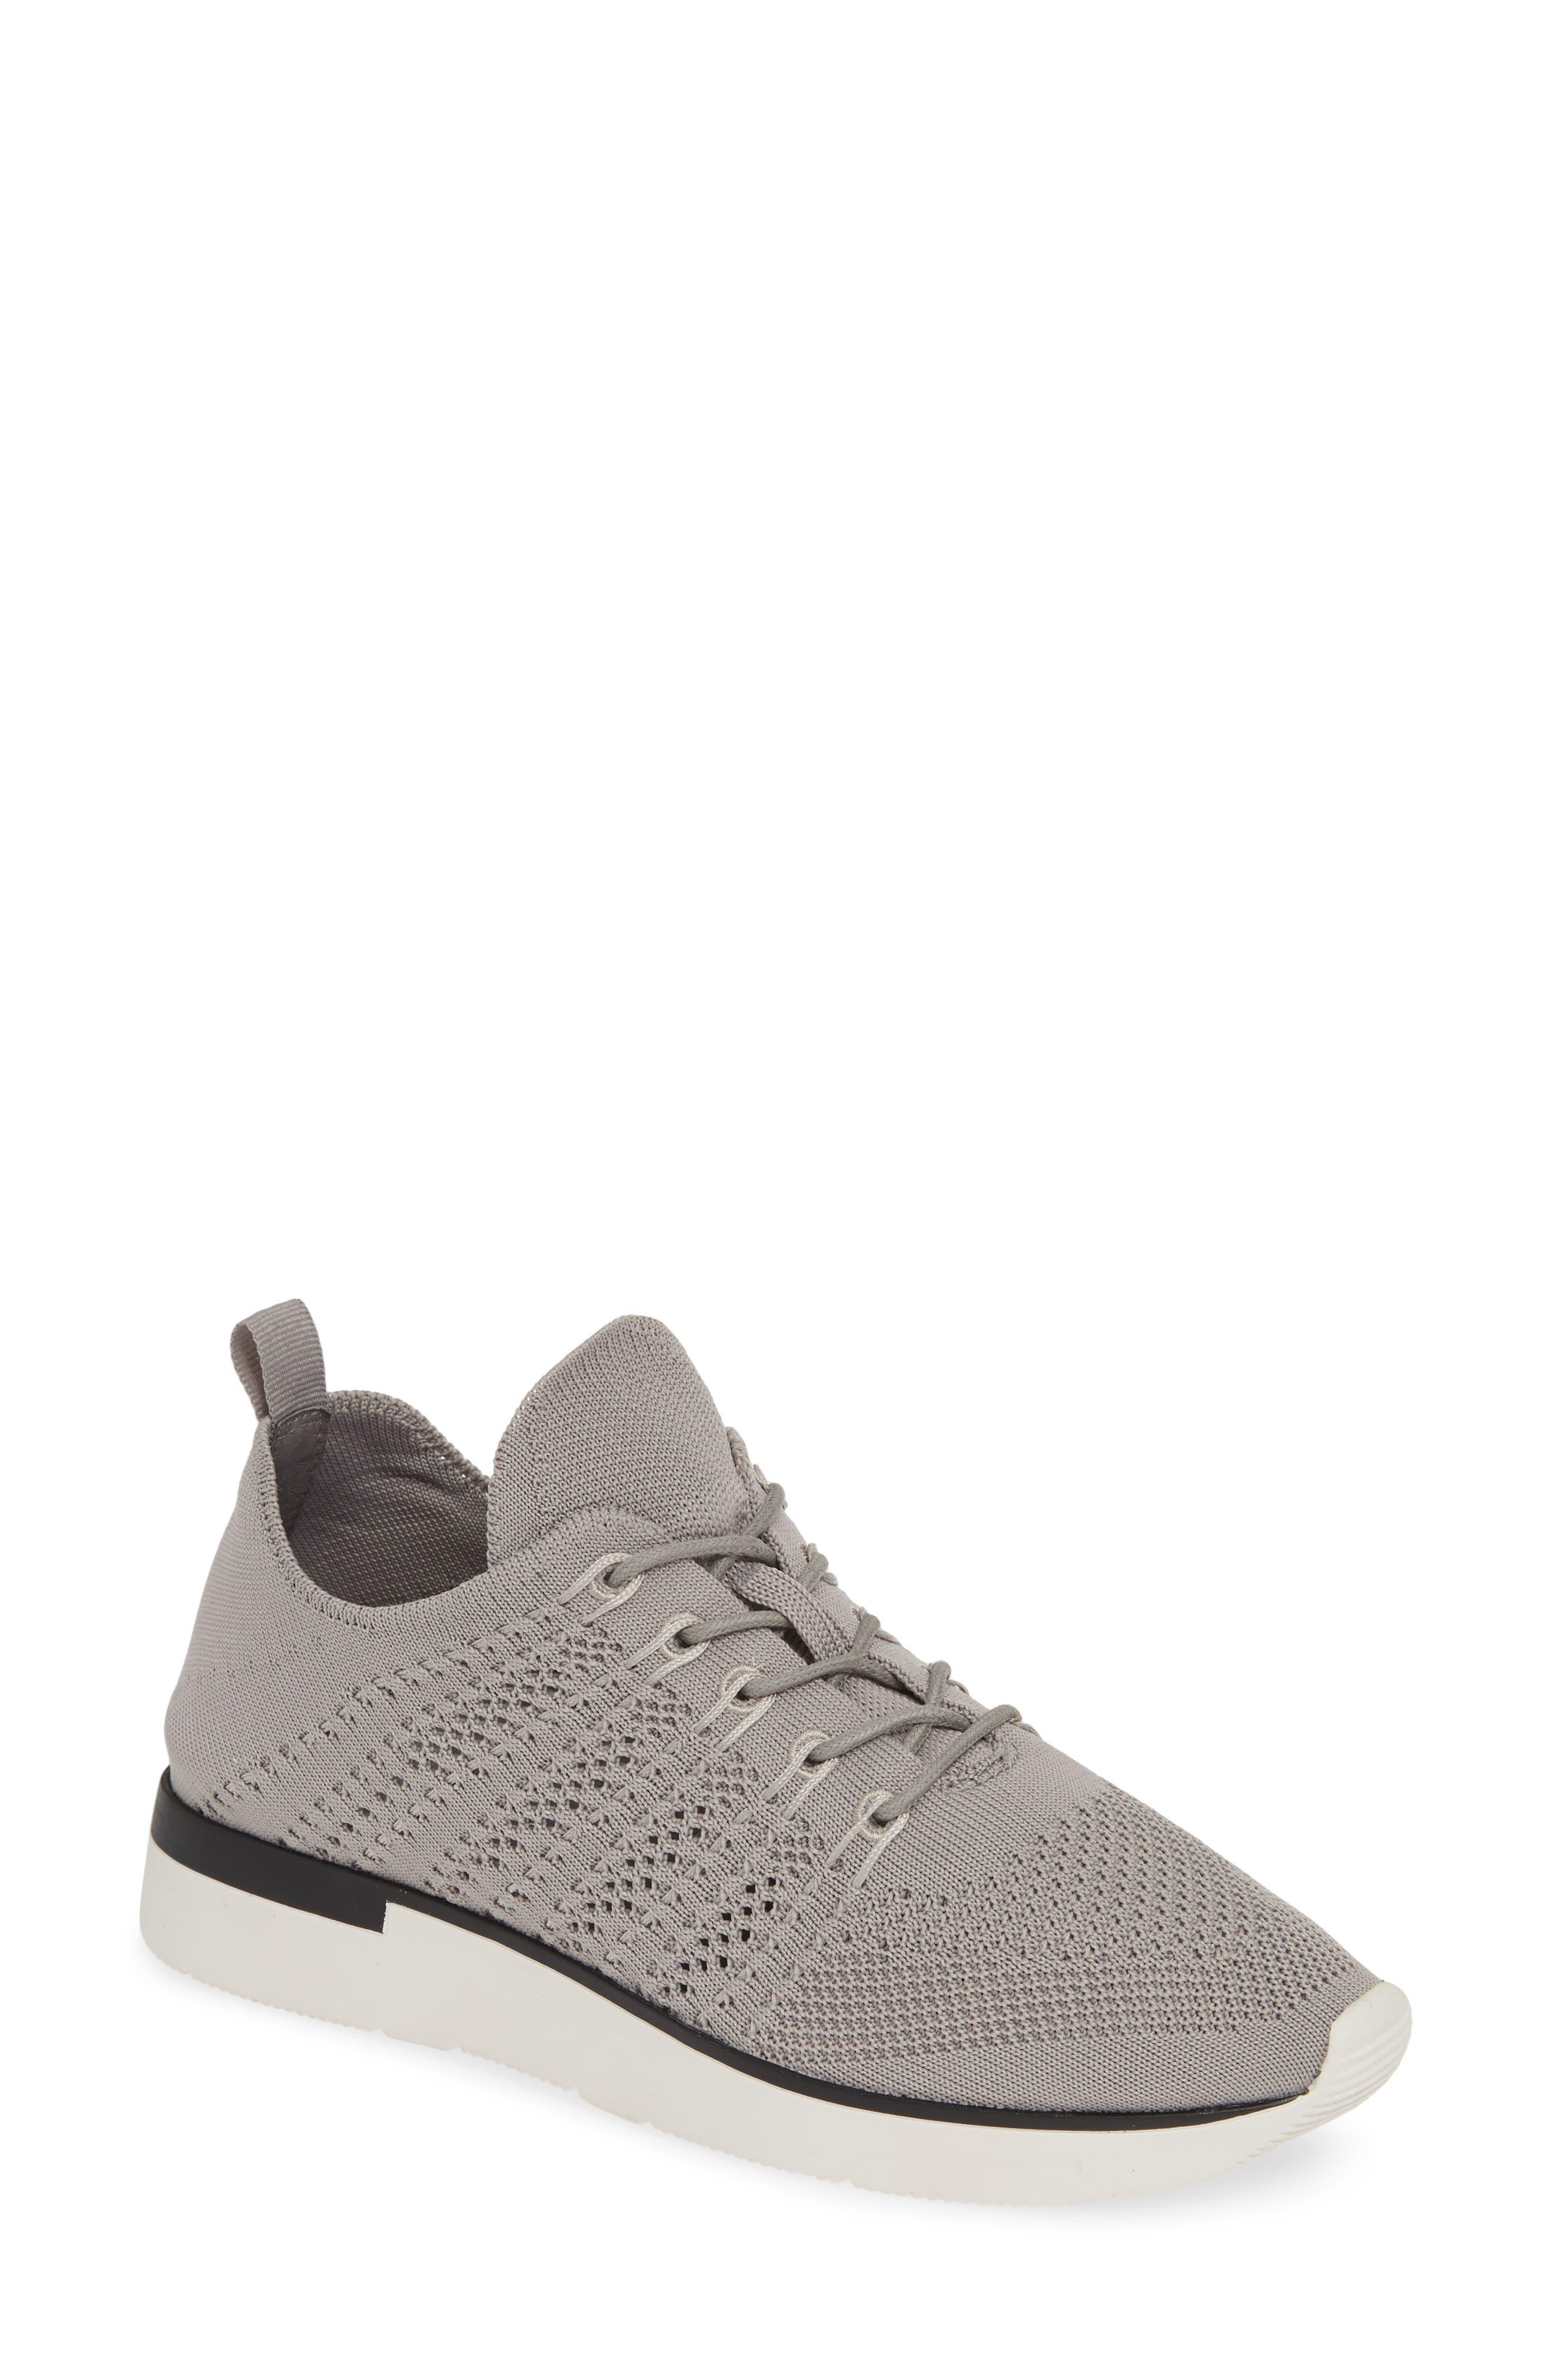 Jslides Gigi Knit Low Top Sneaker, Grey